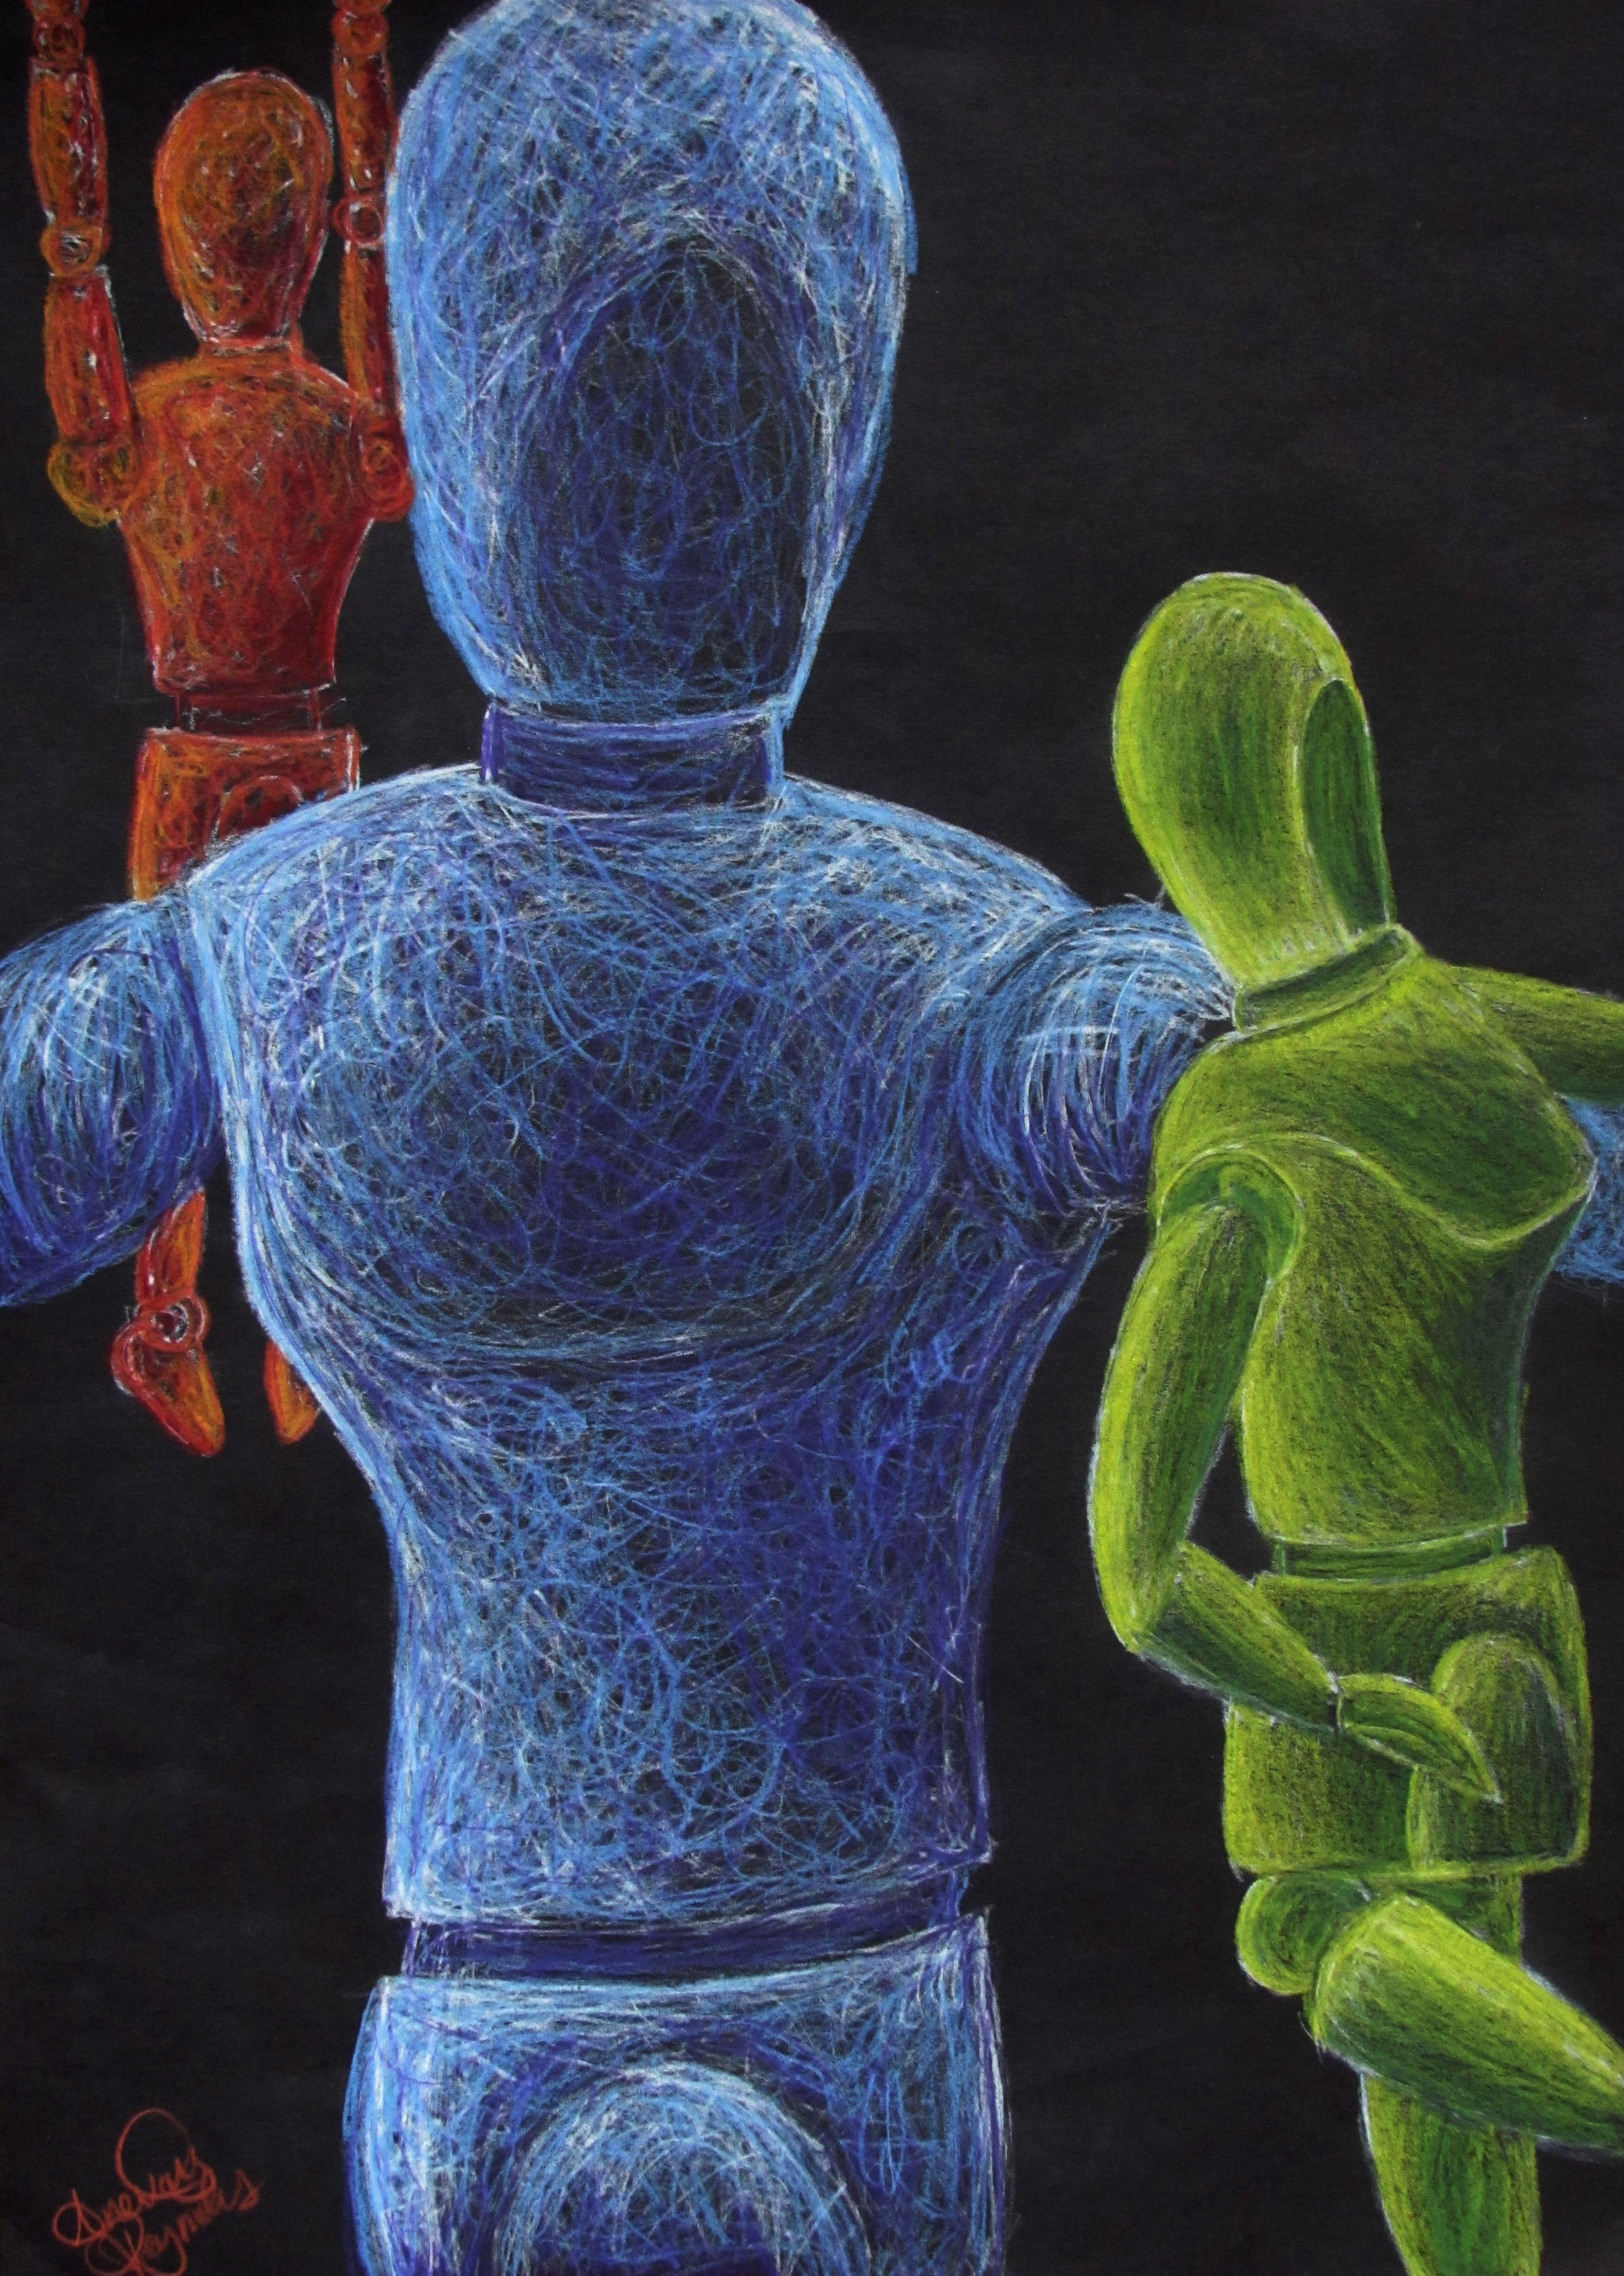 Mannequin Study W Colored Pencil On Black Sulphite